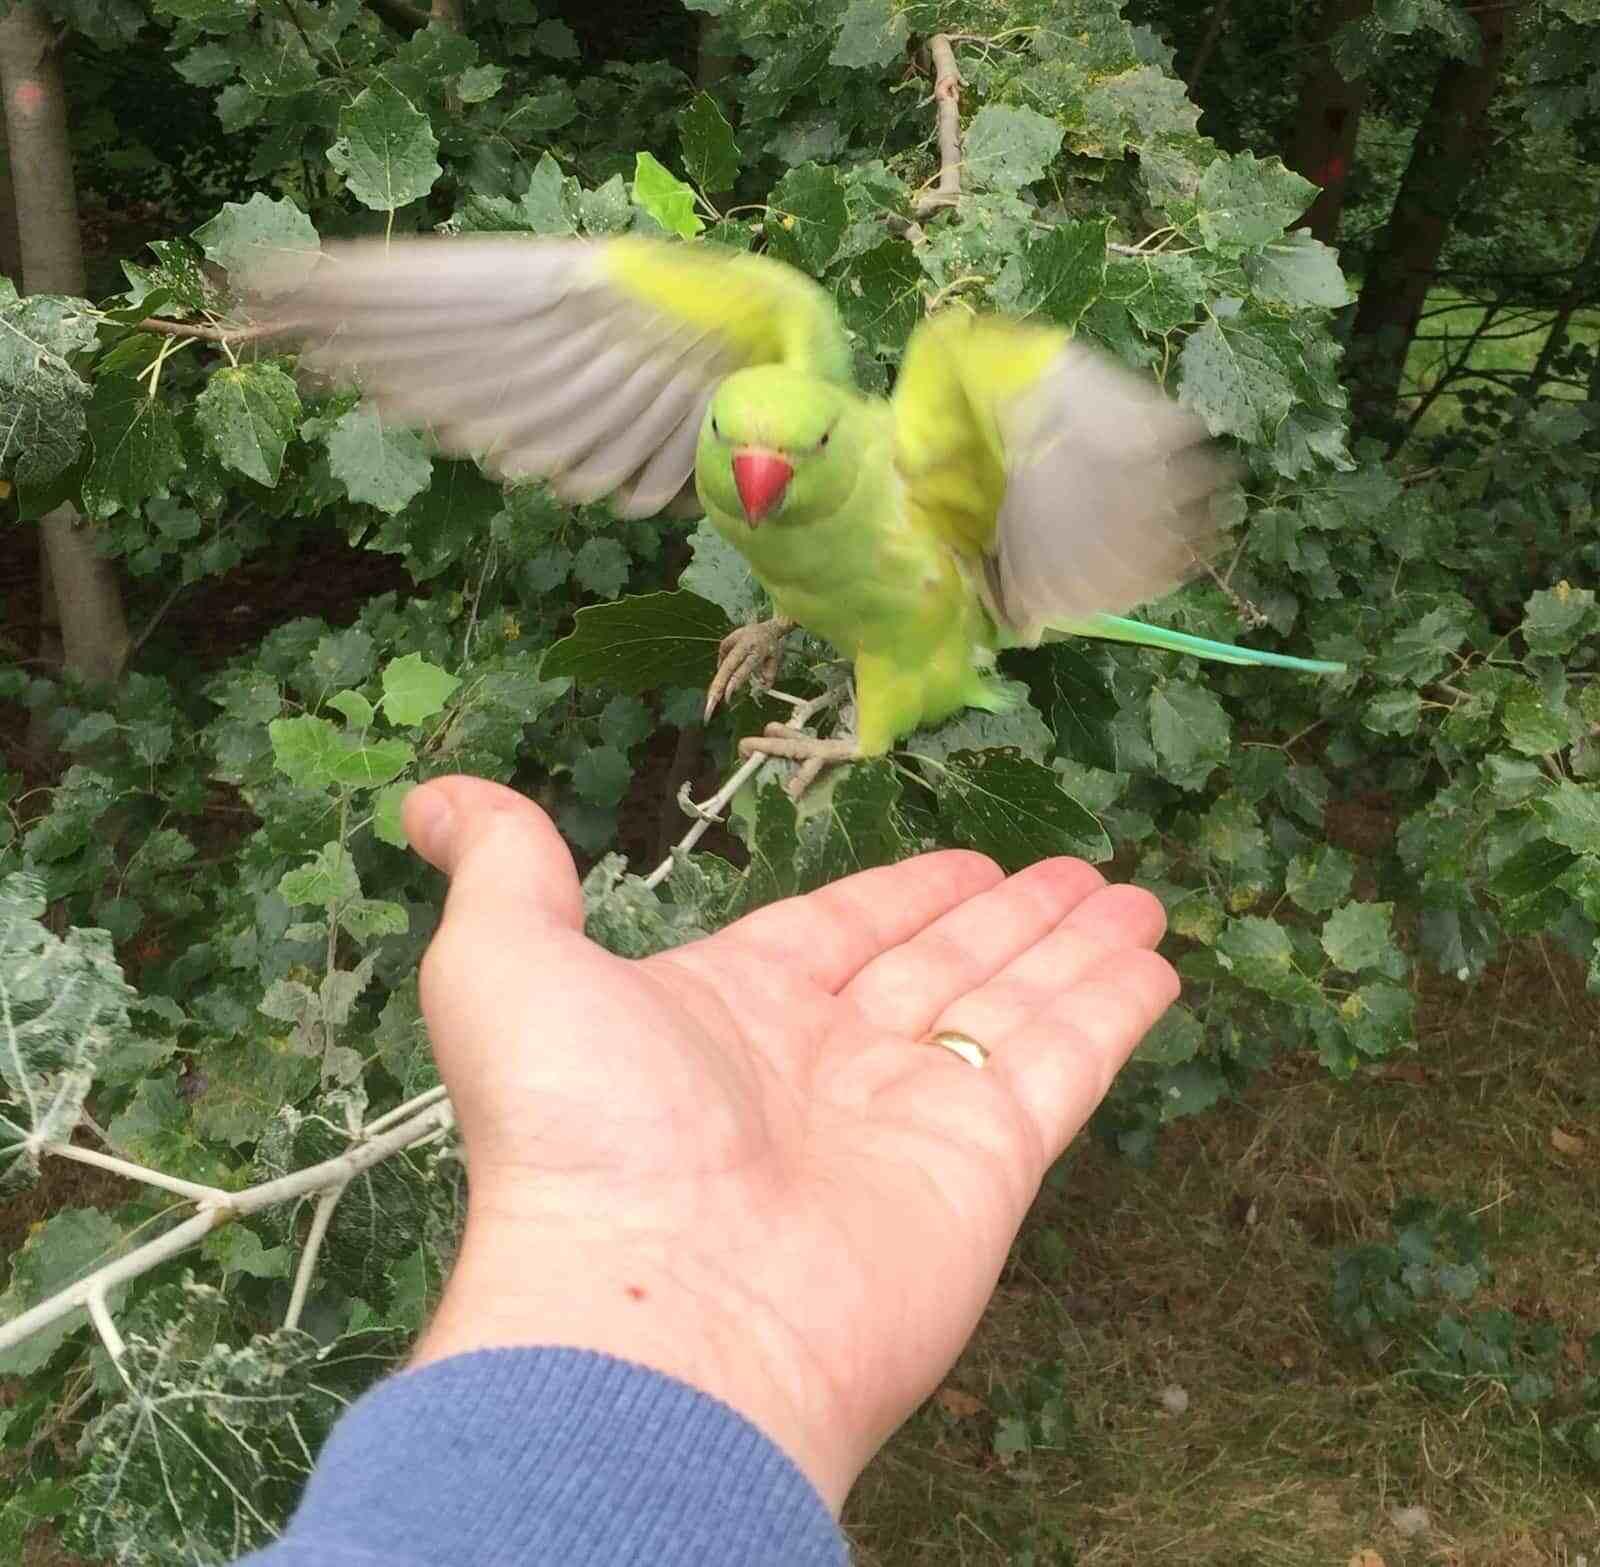 Kensington Gardens parakeet on a hand.